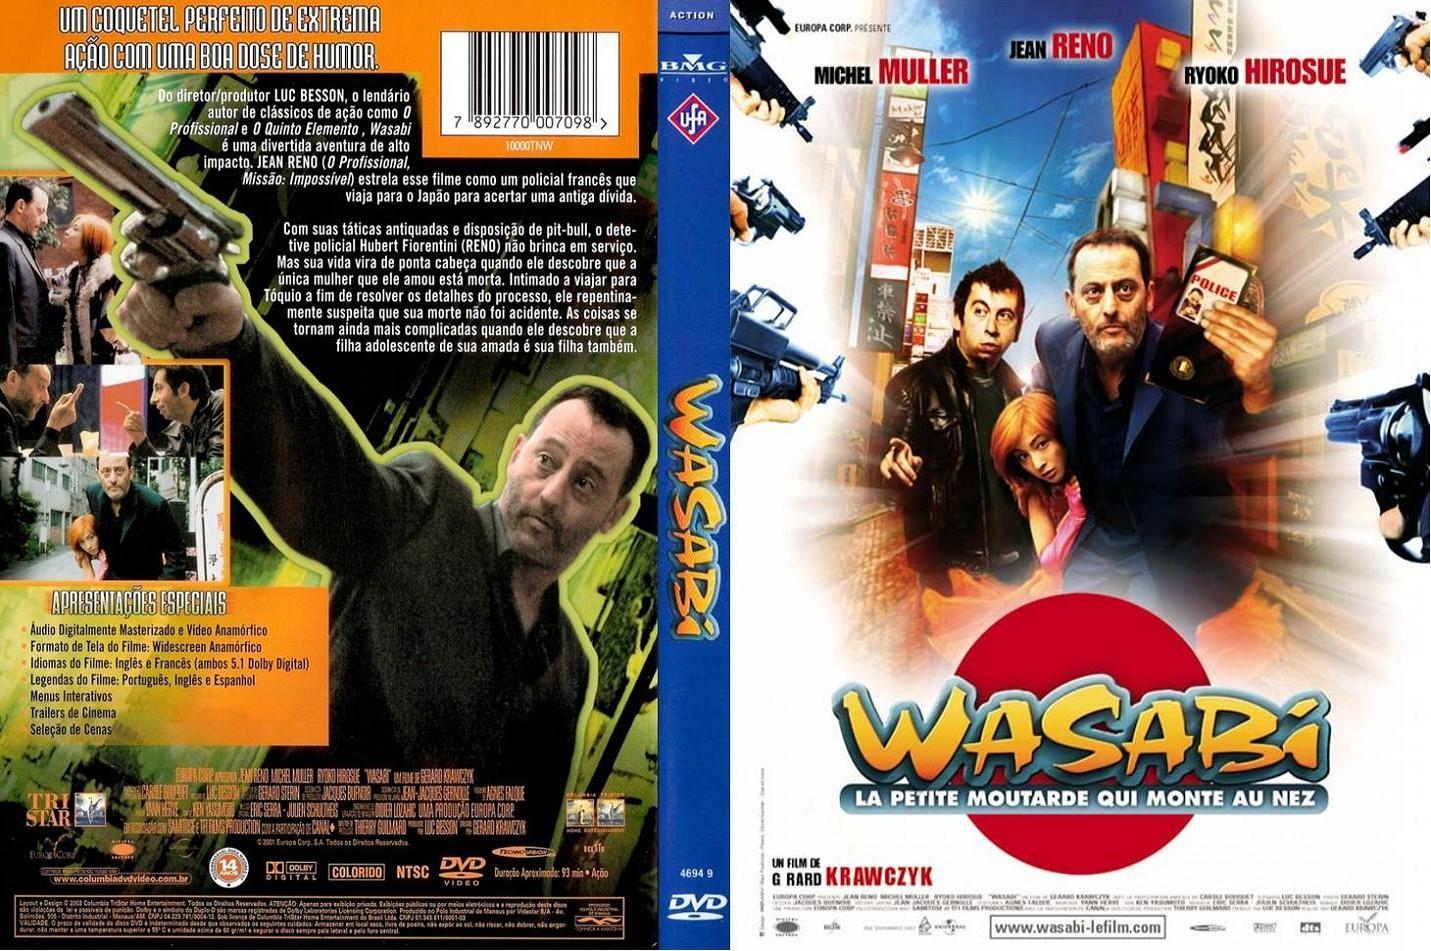 Capas Filmes Policial: Wasabi